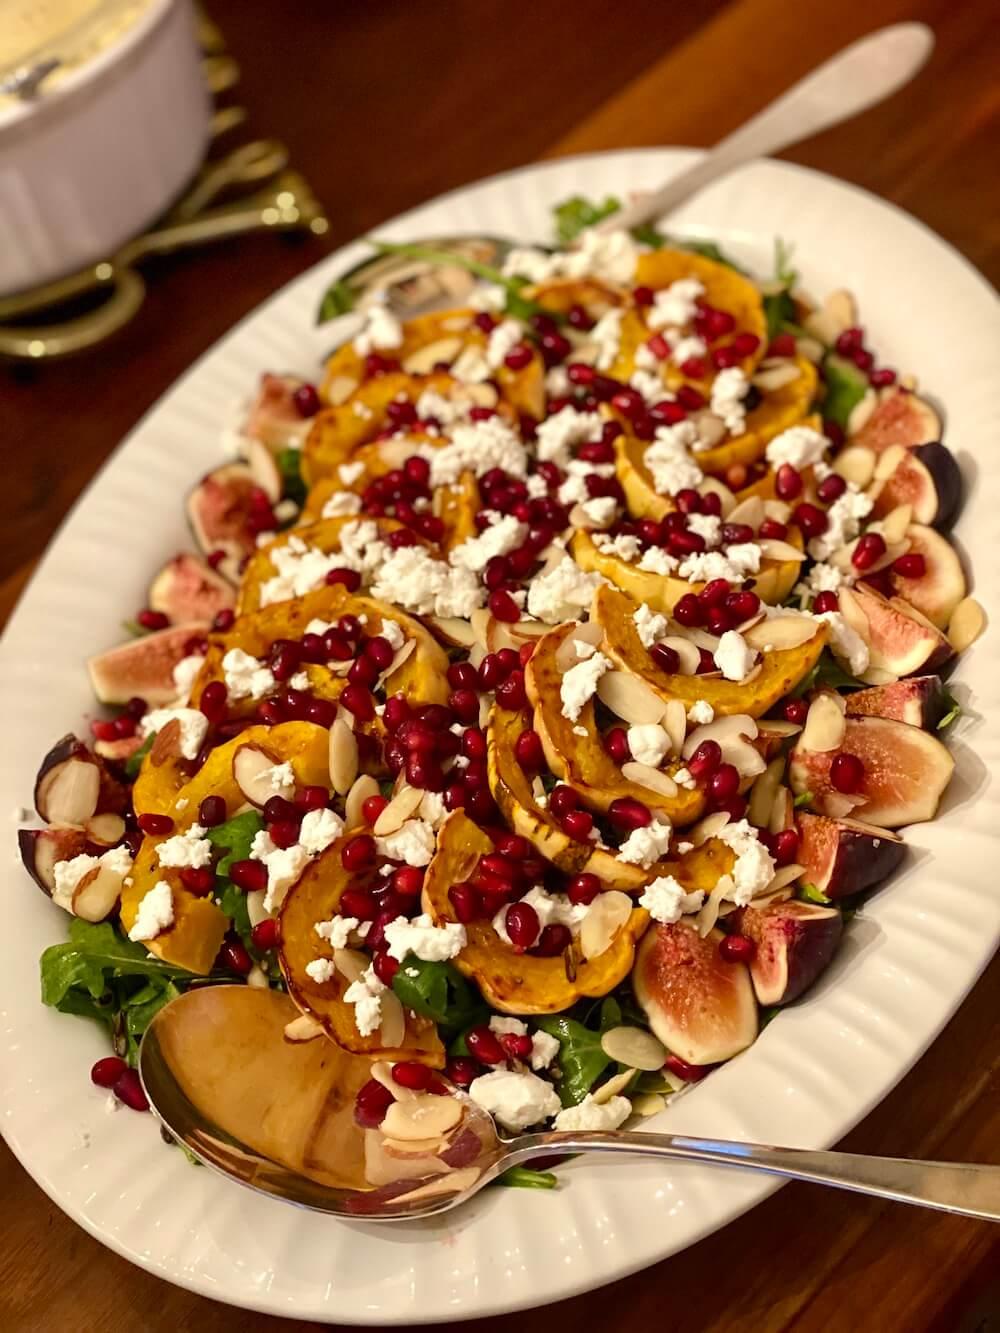 arugula salad with delicata squash